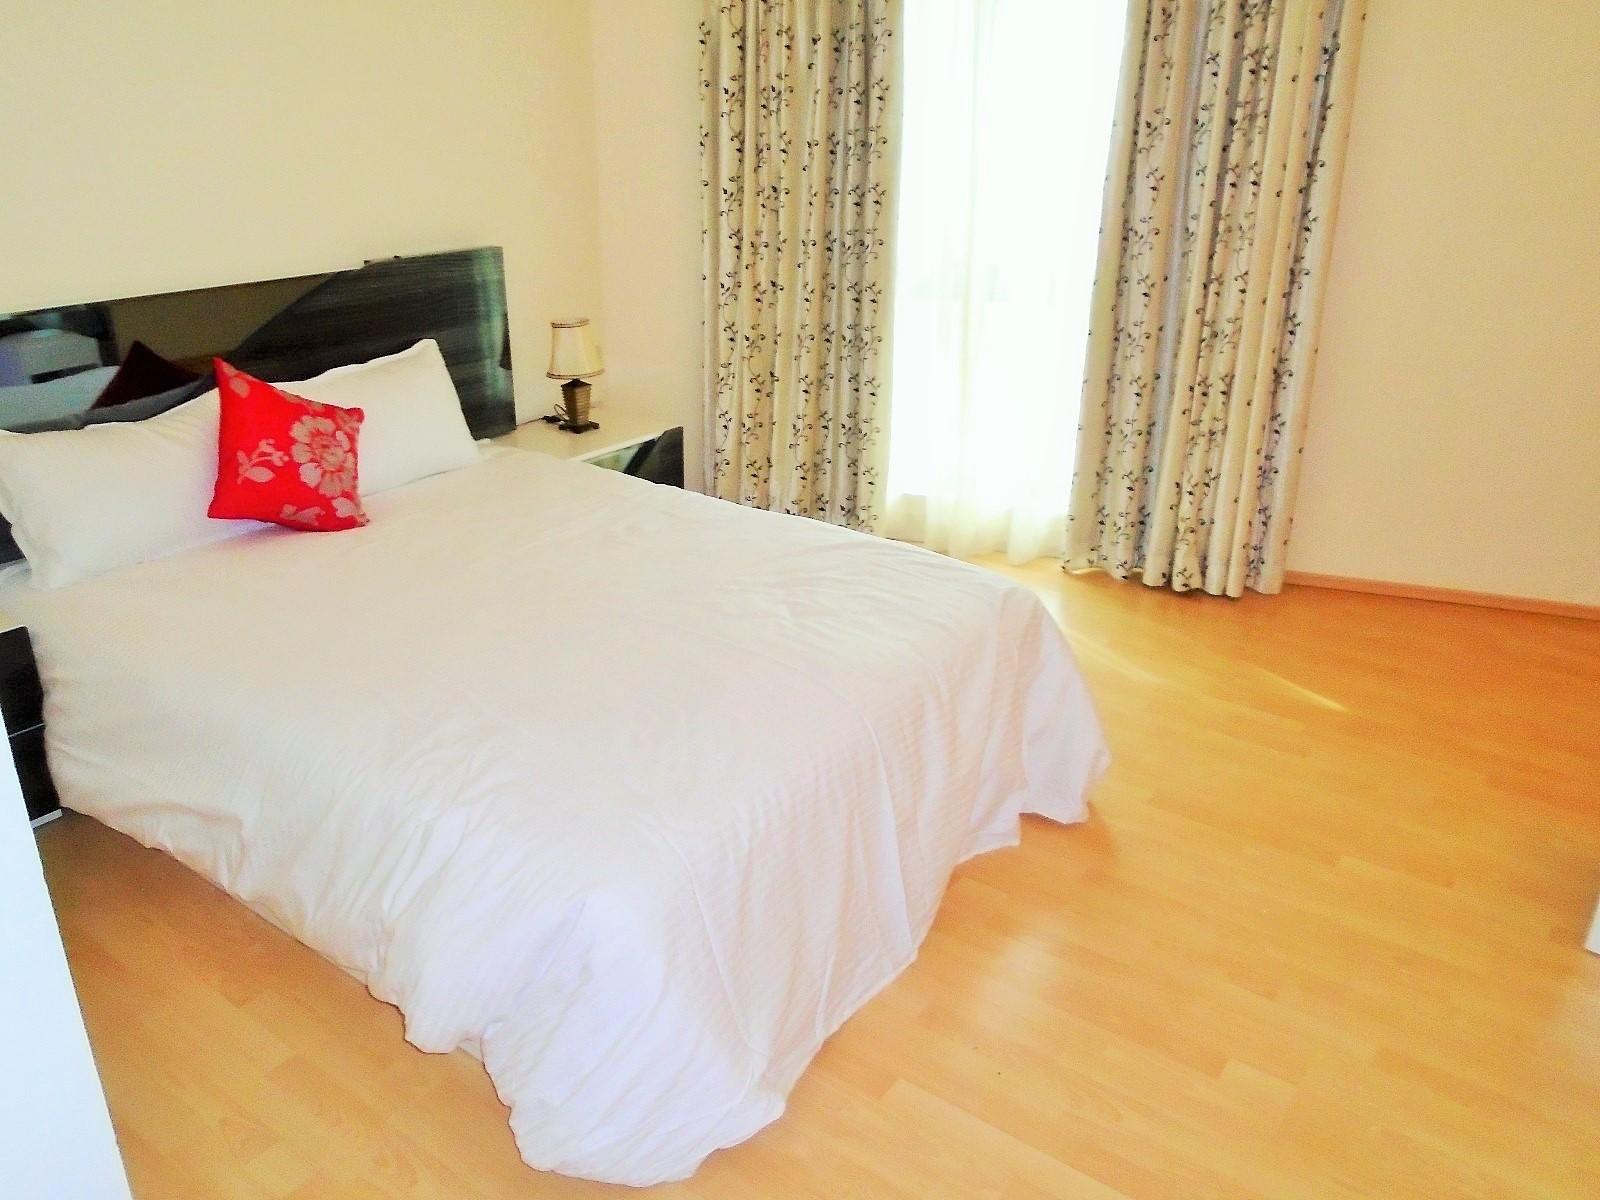 2 Bedroom Dublex 7